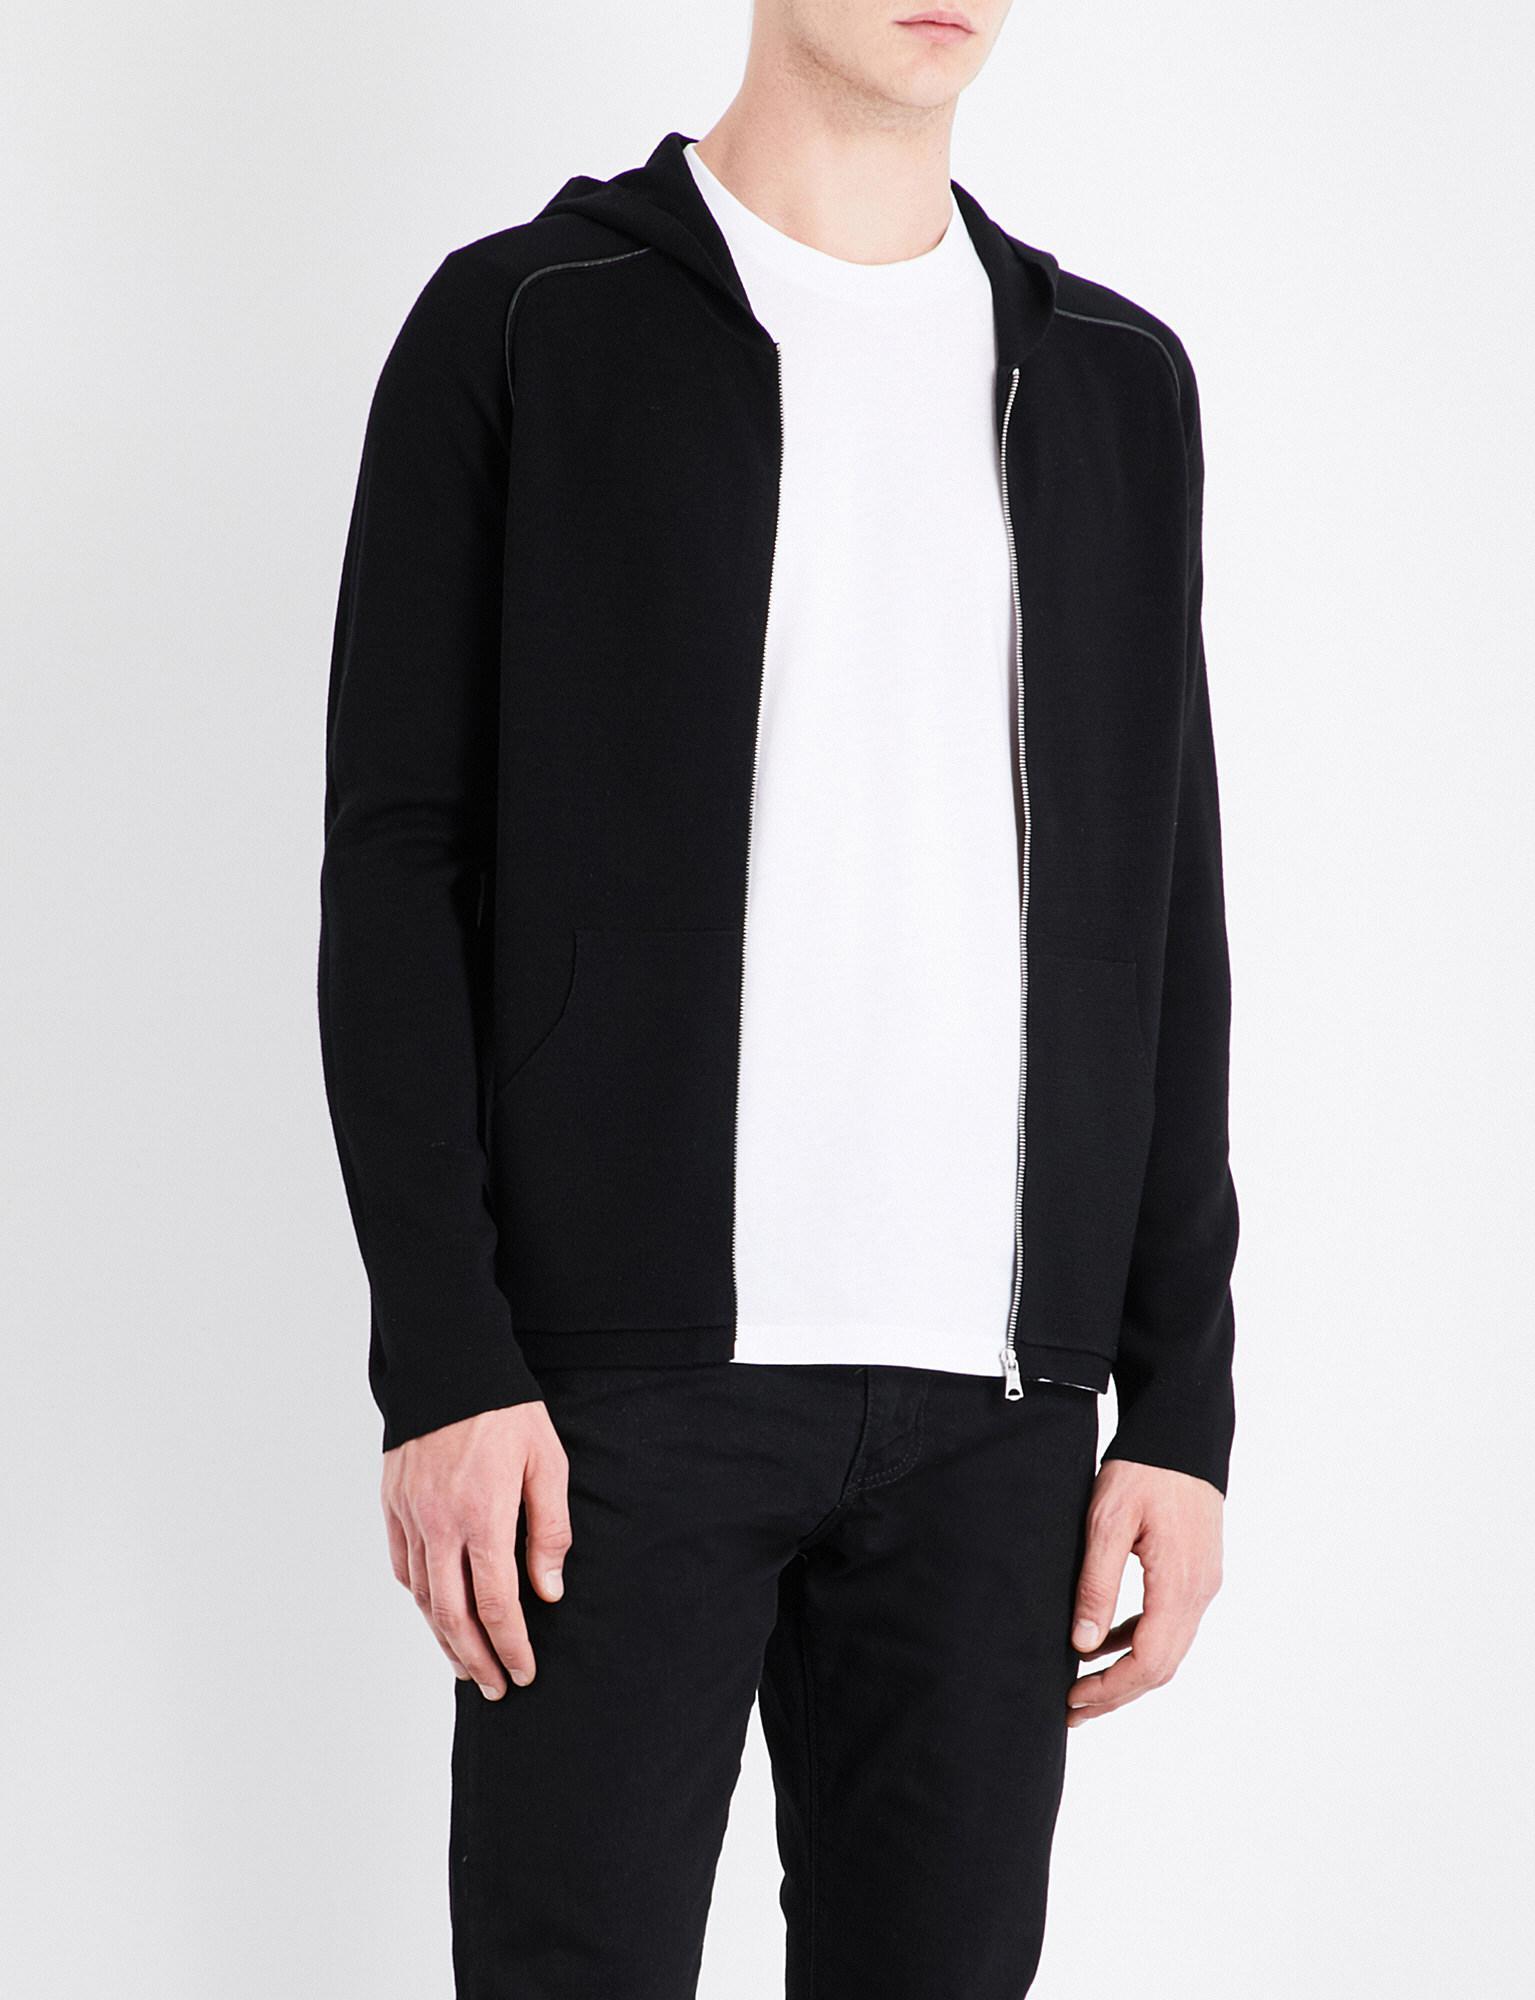 Sandro. Men's Black Zip-up Wool Hoody